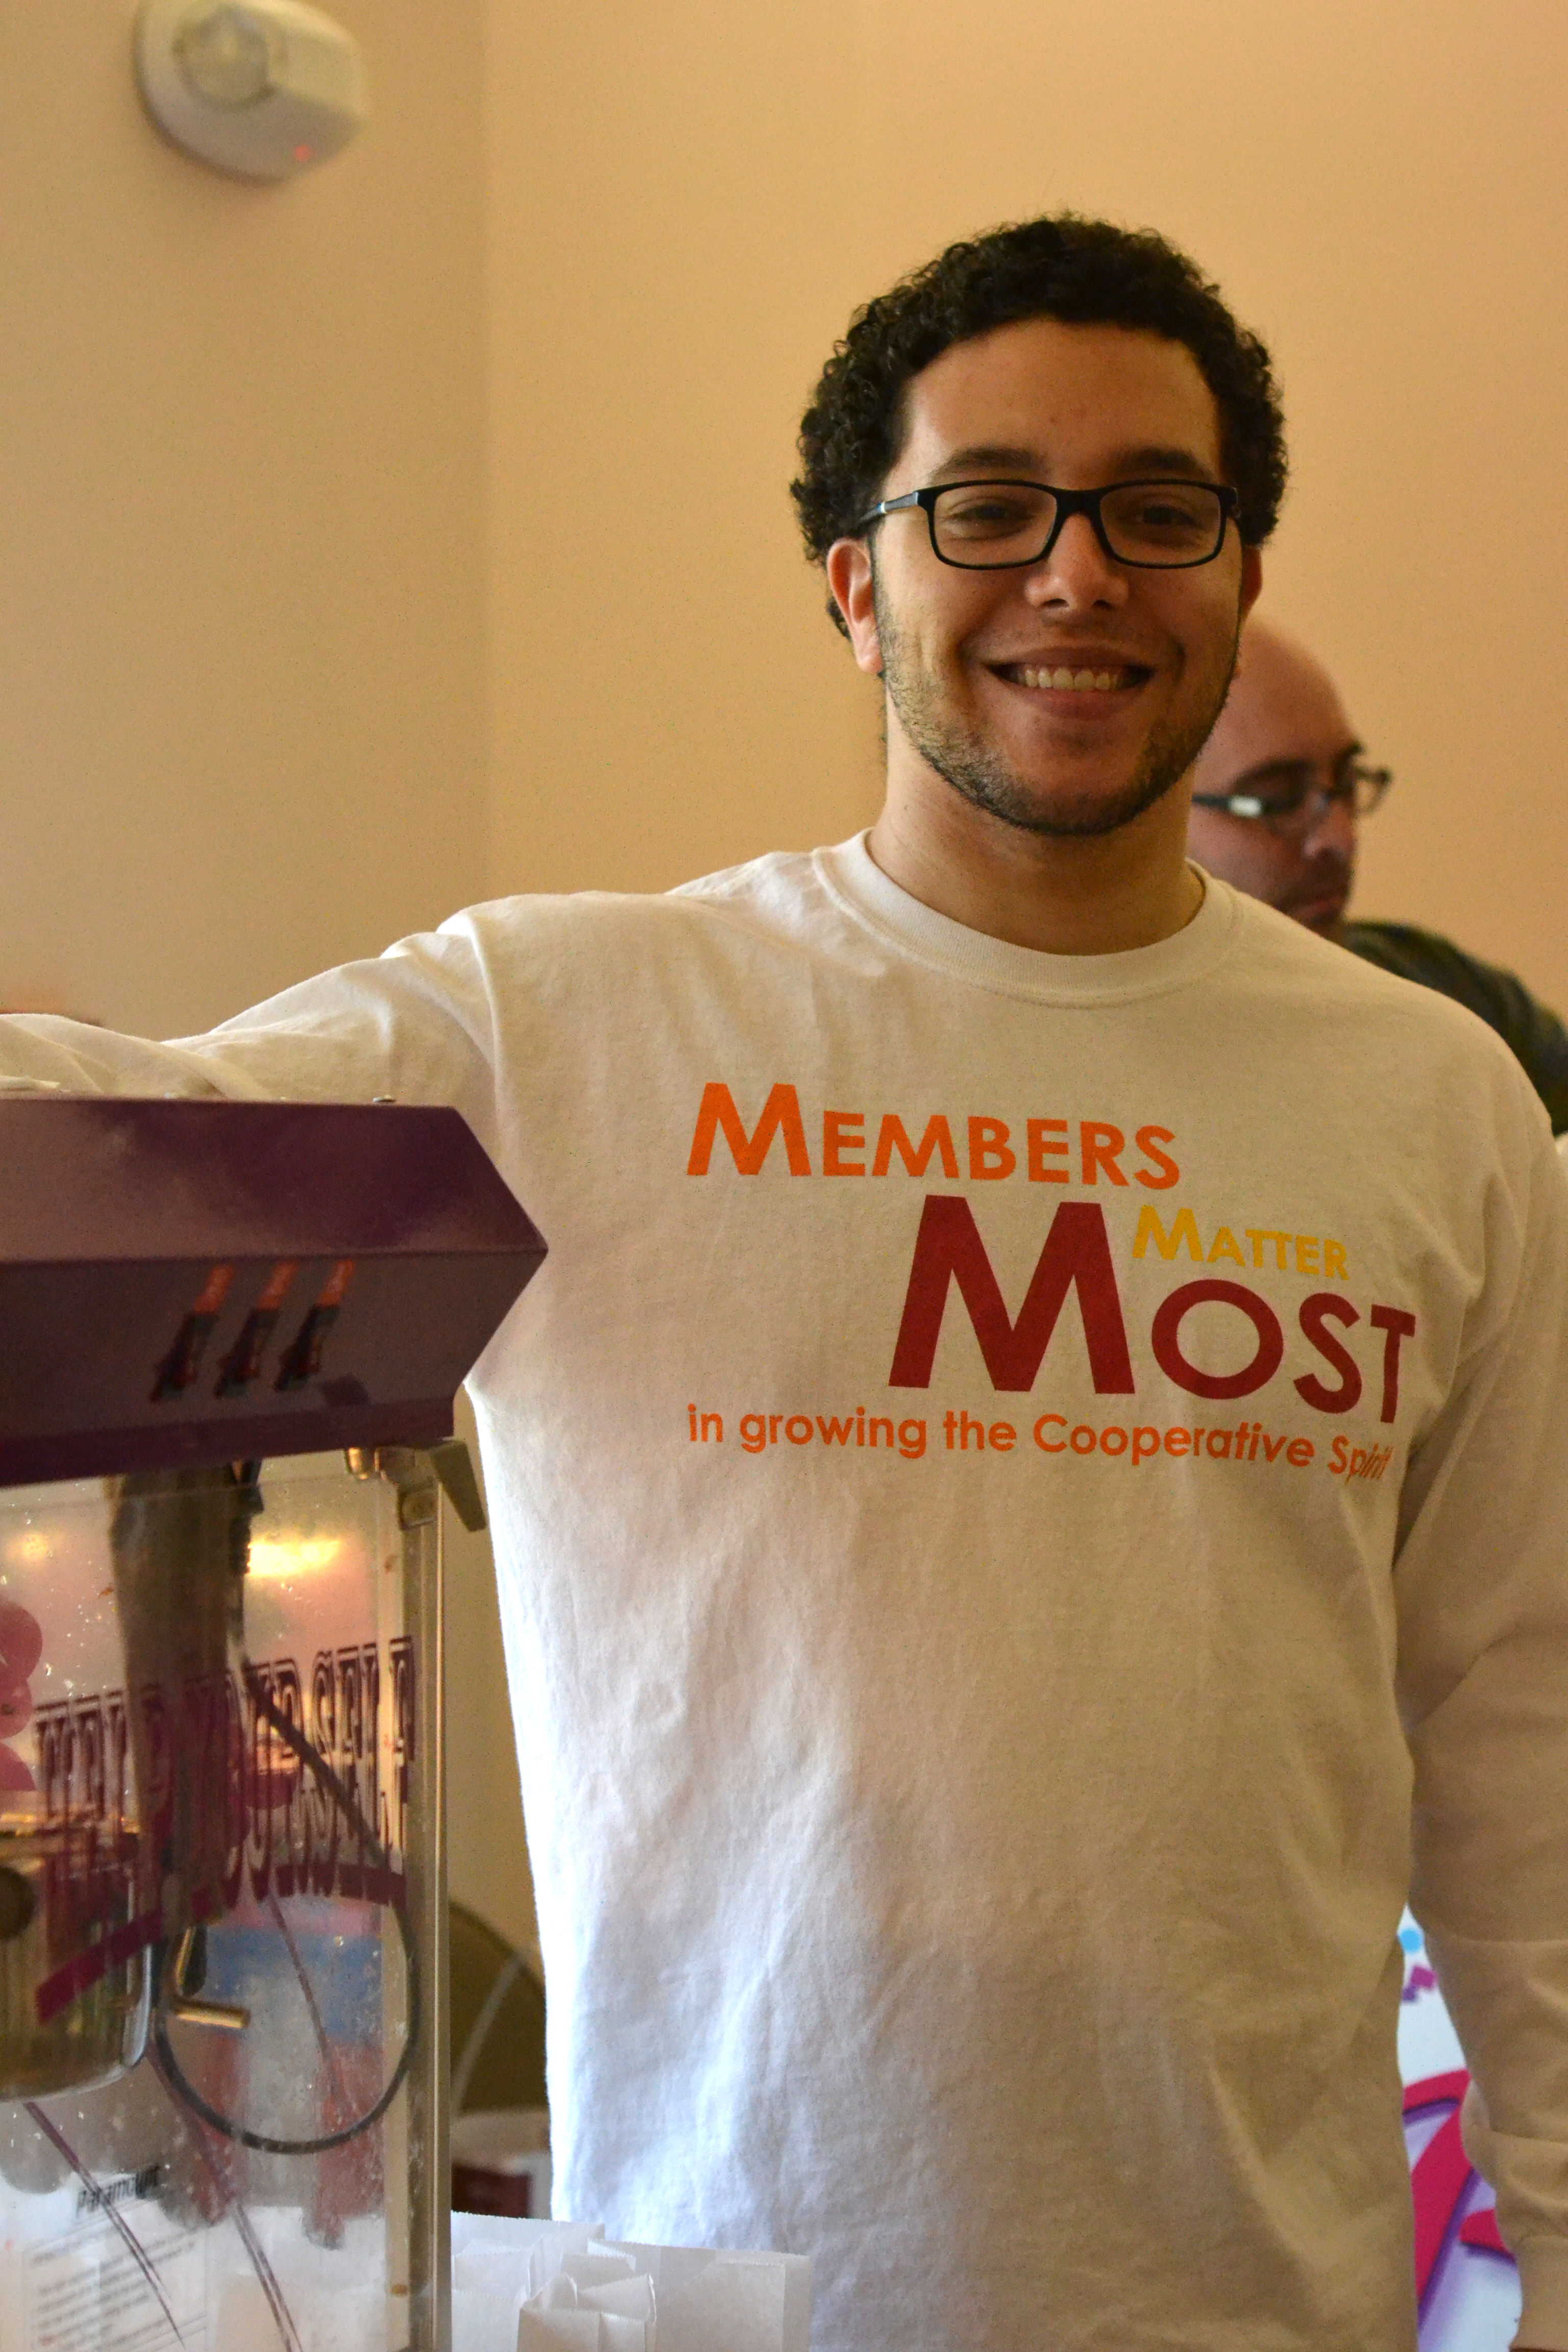 Sean Capaloff-Jones of UMass Five College Federal Credit Union. [photo credit: Rebekah Hanlon]